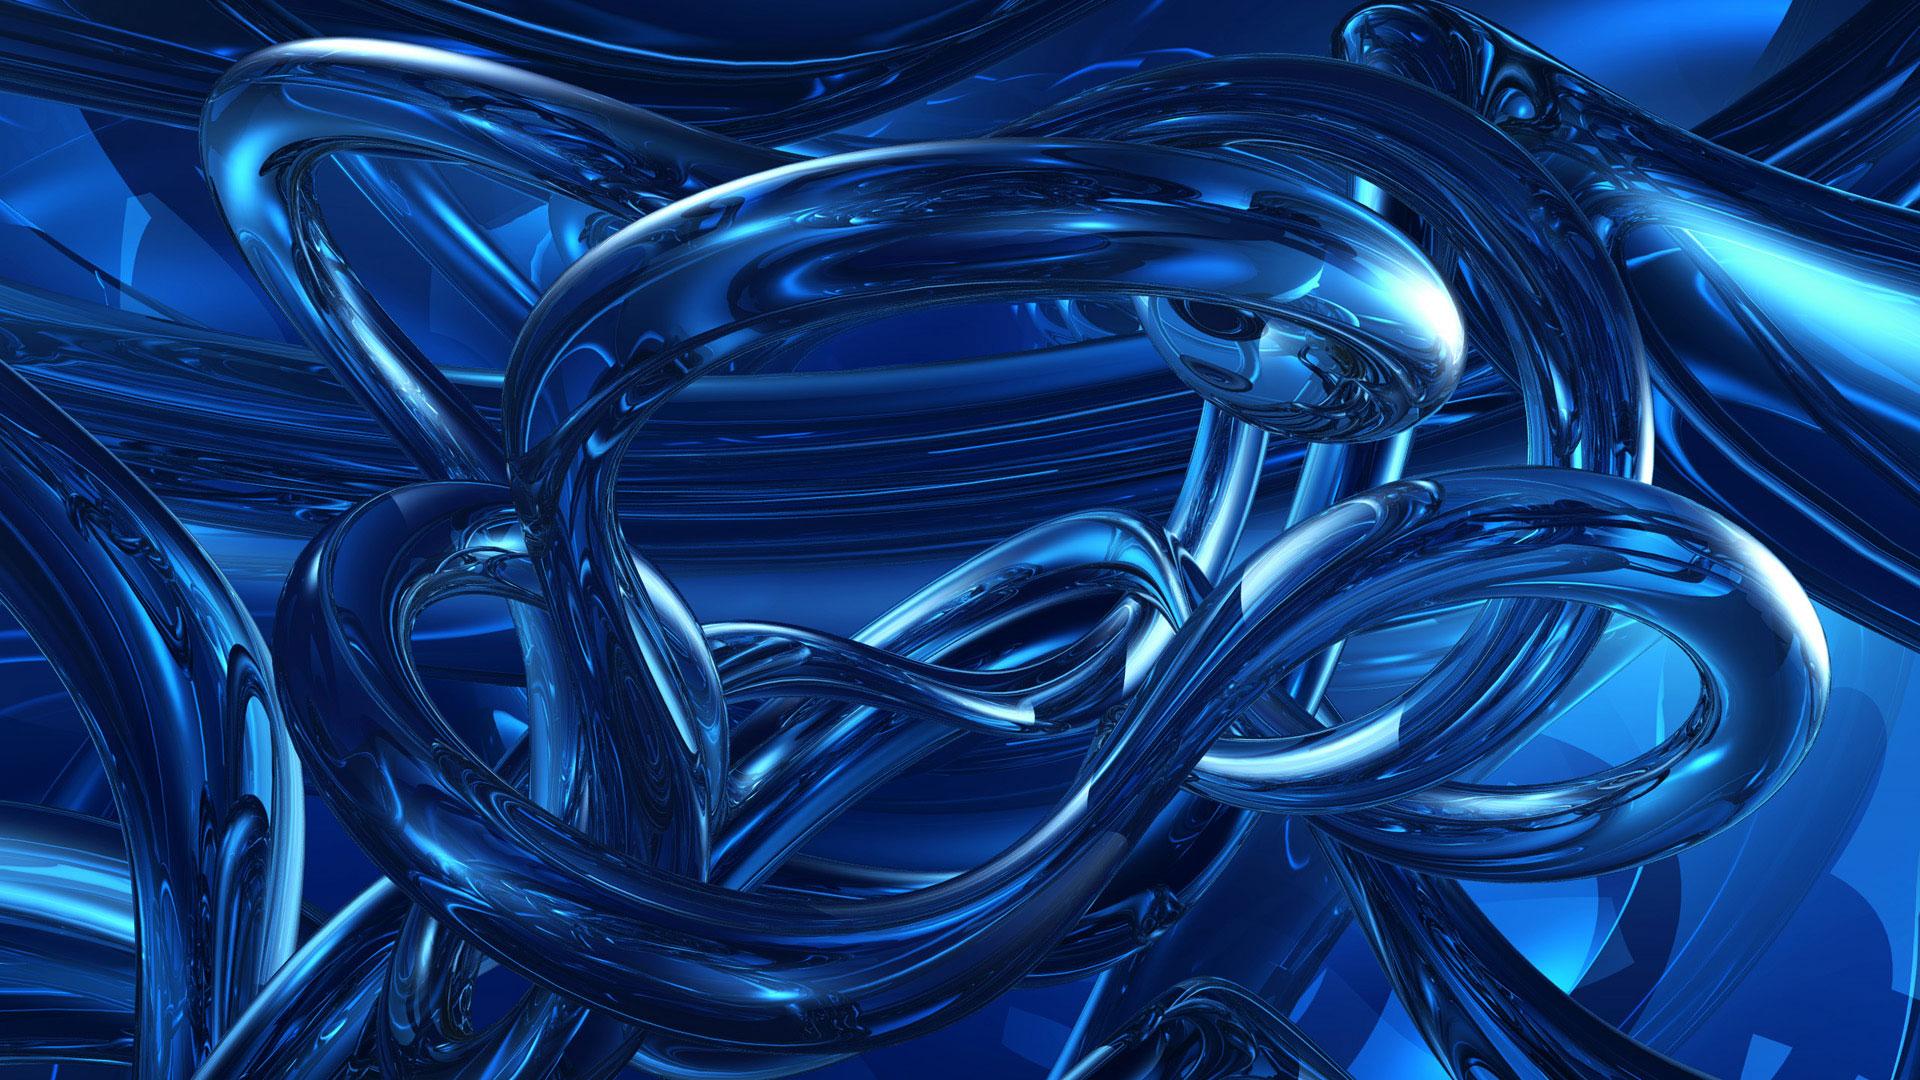 Earth And Moon 3d Wallpaper Dark Blue Wallpaper Hd Pixelstalk Net